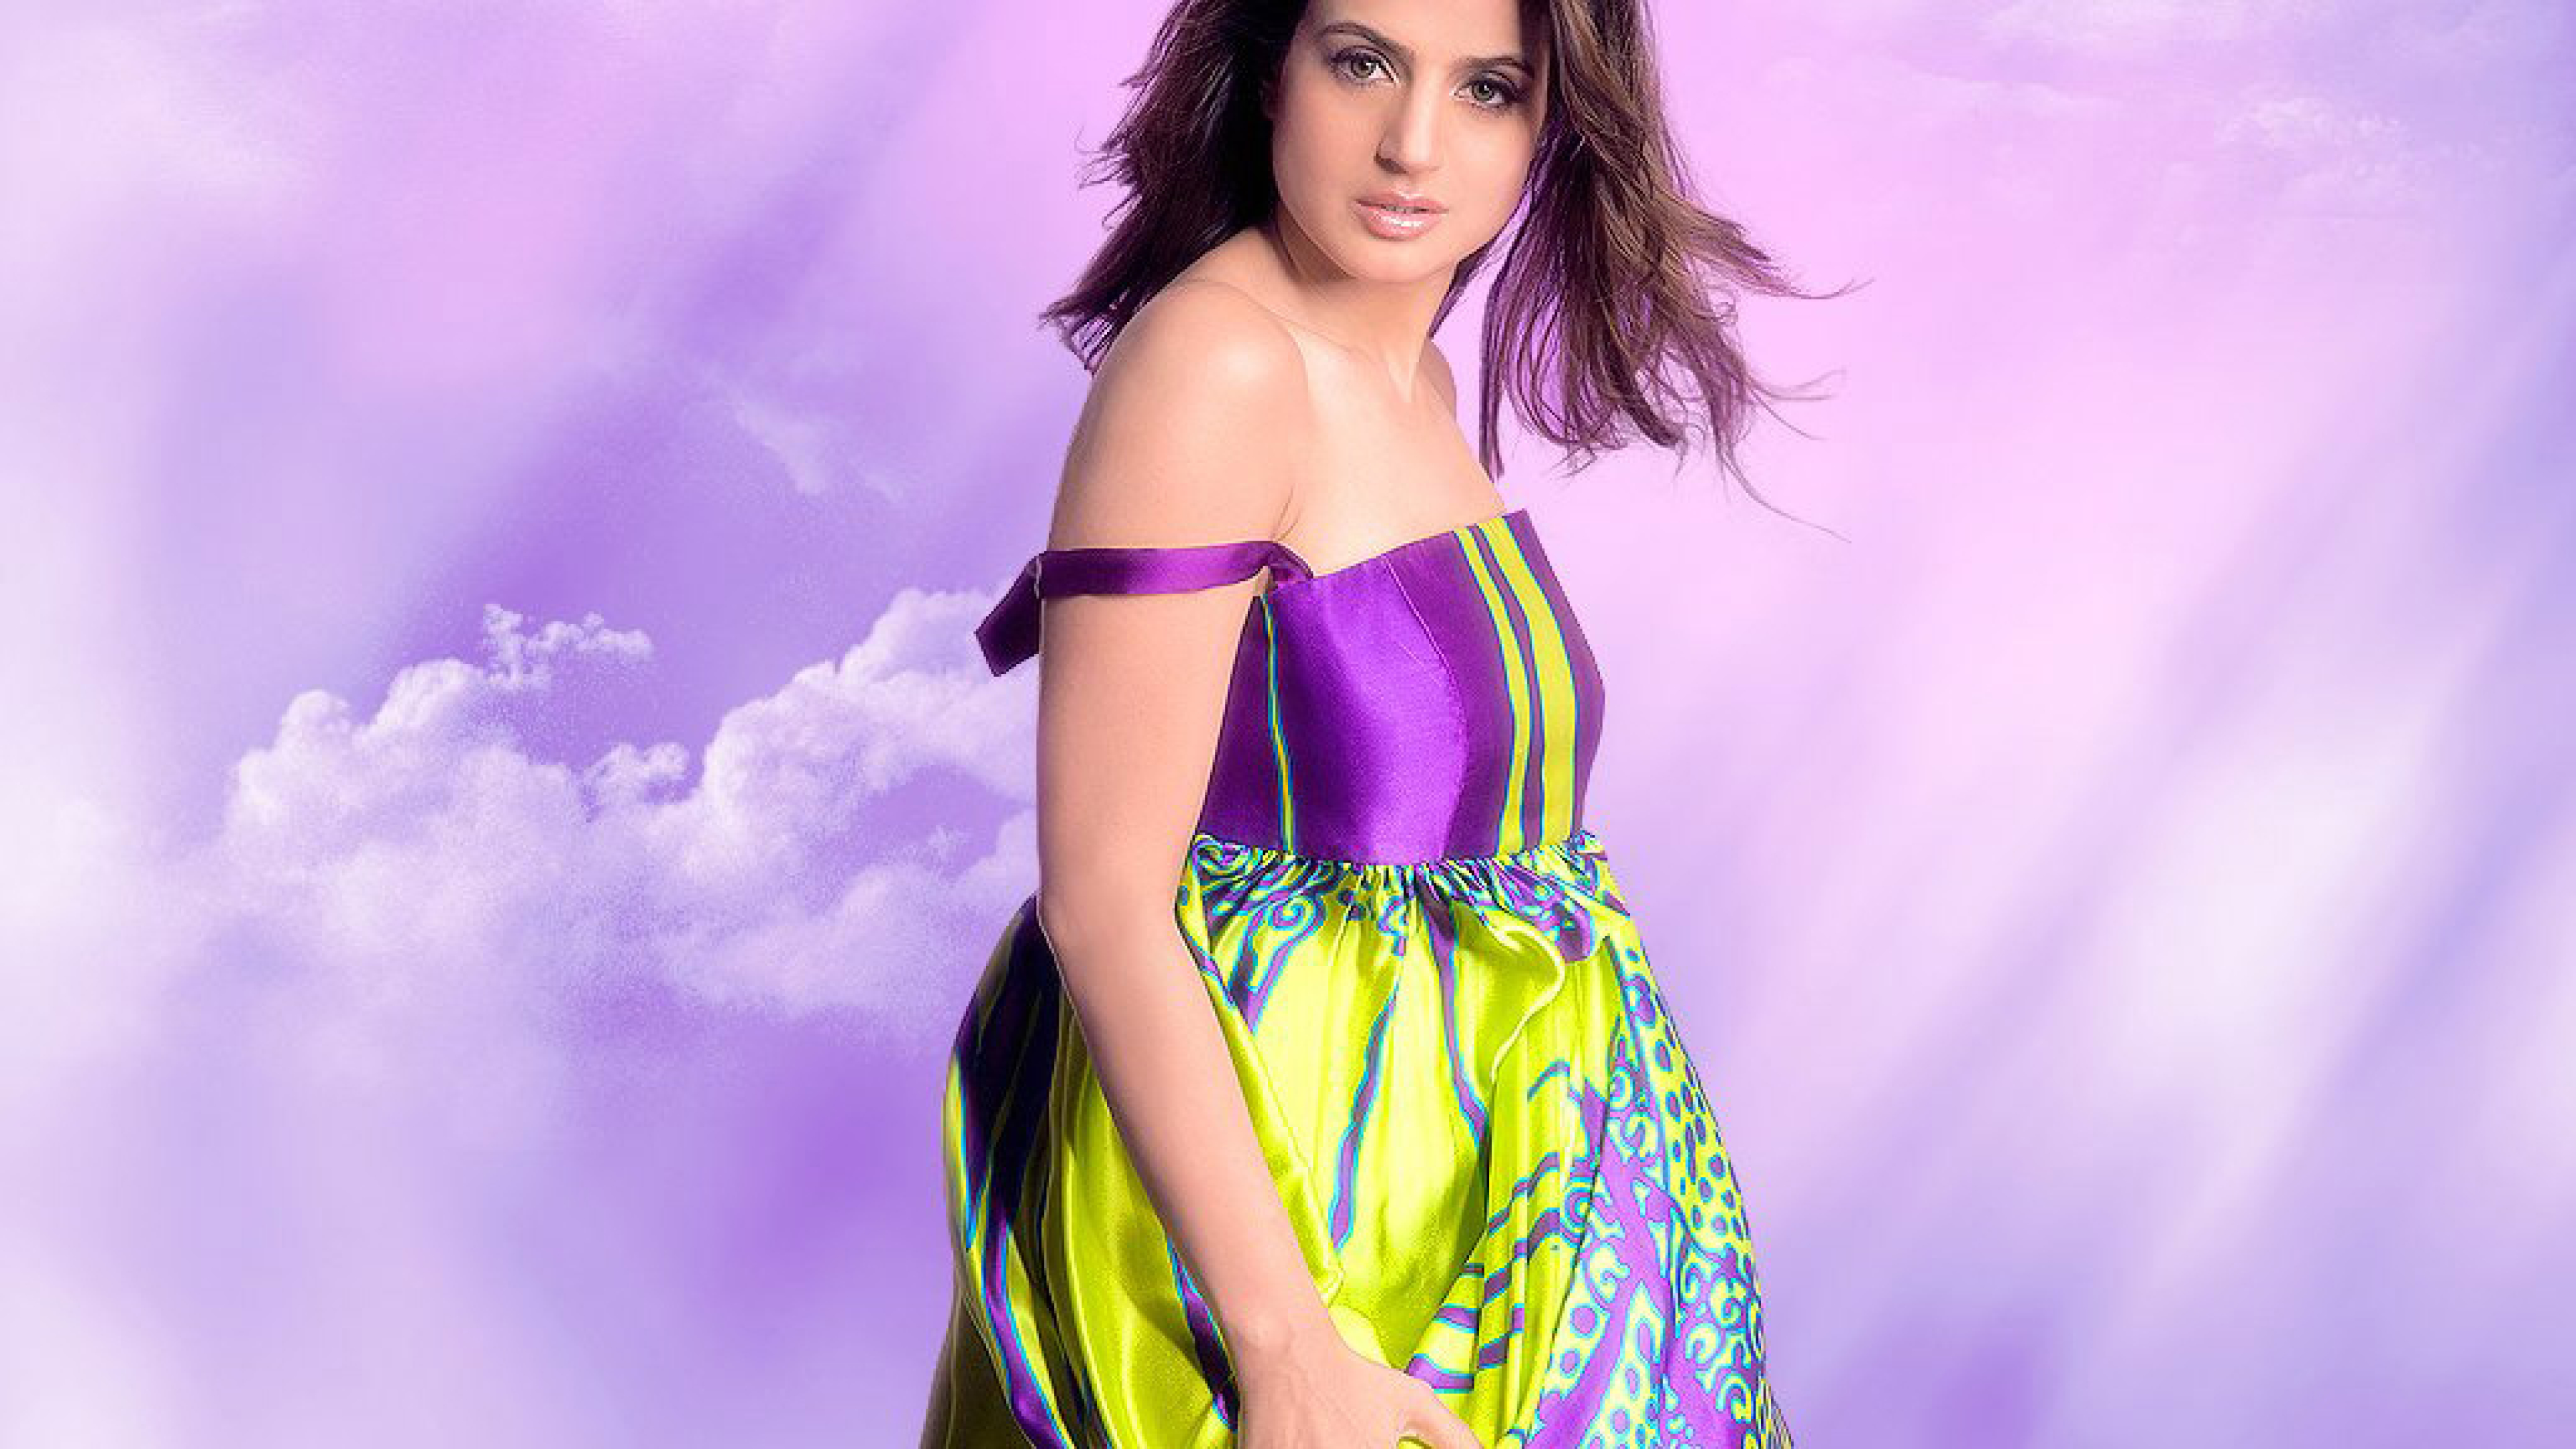 Fukrey Look: Ameesha Patel HD Wallpaper 2013